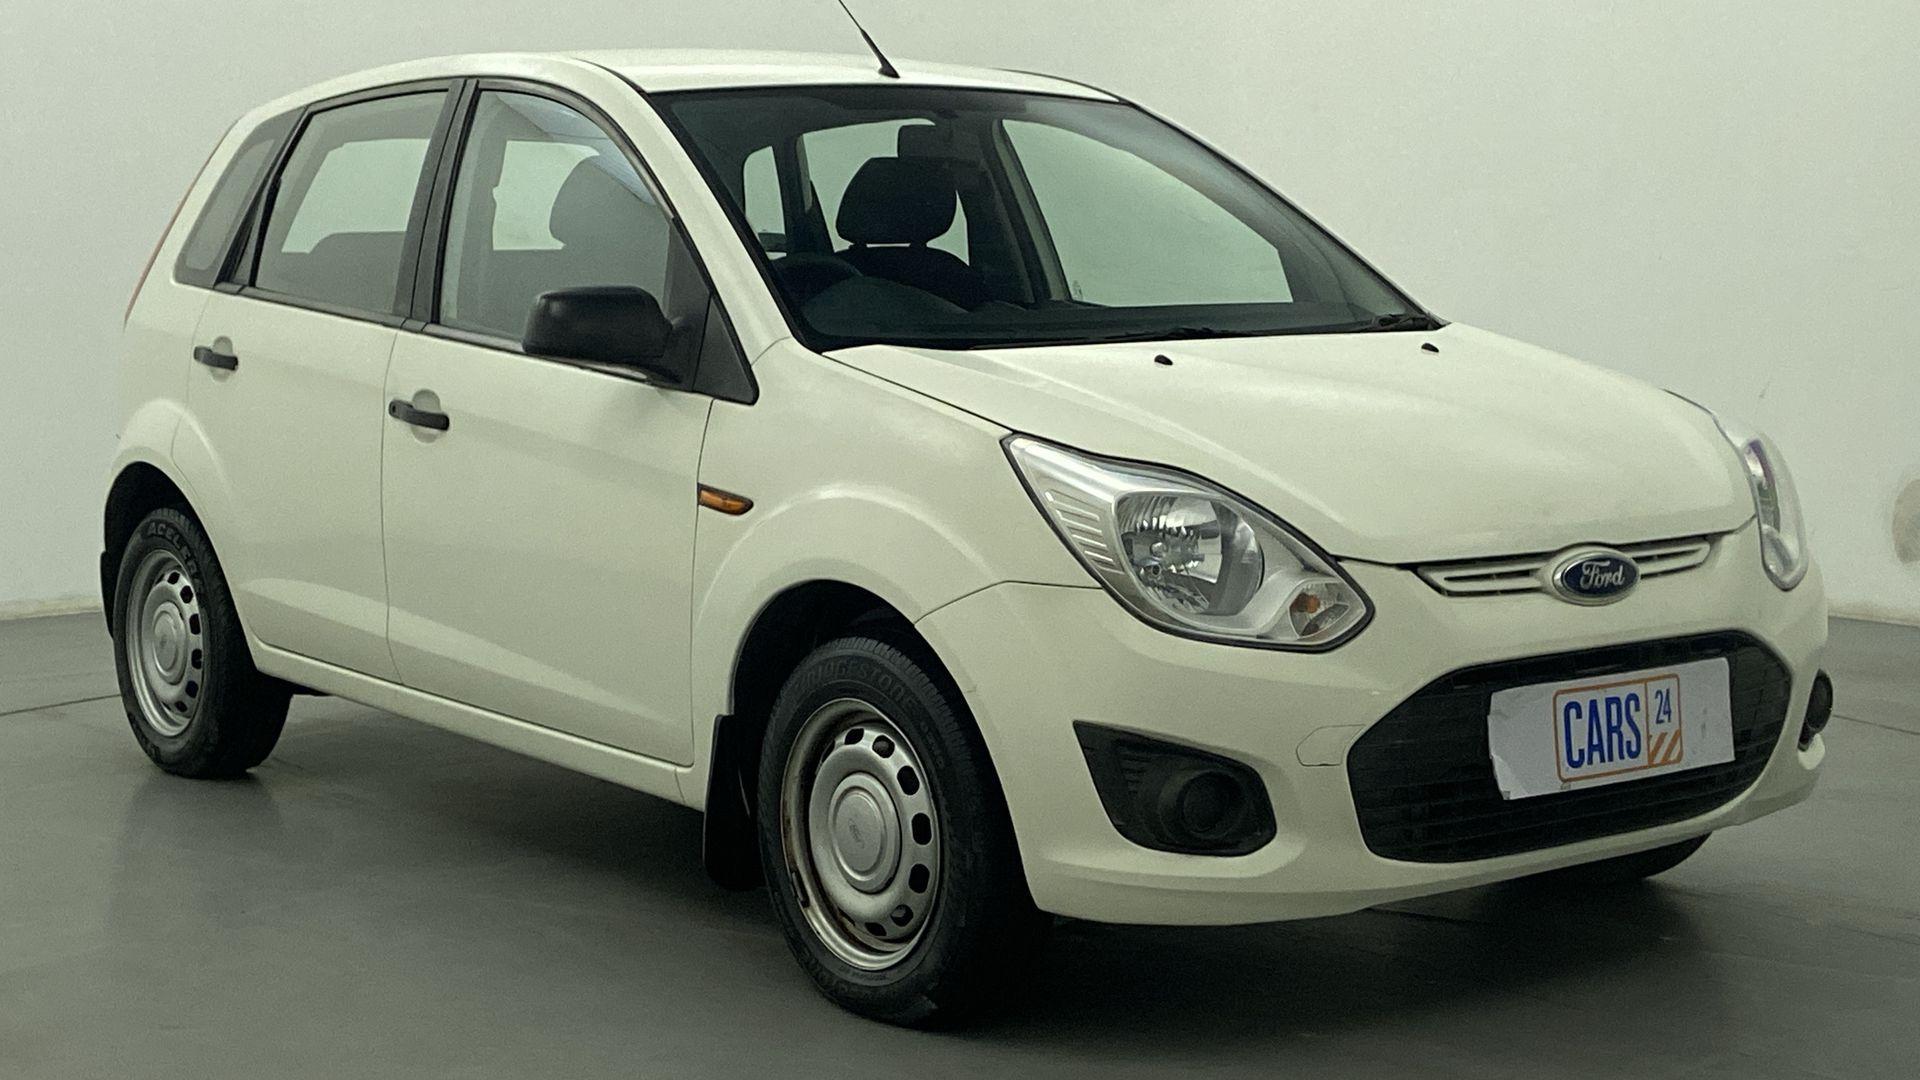 2012 Ford Figo 1.4 LXI DURATORQ